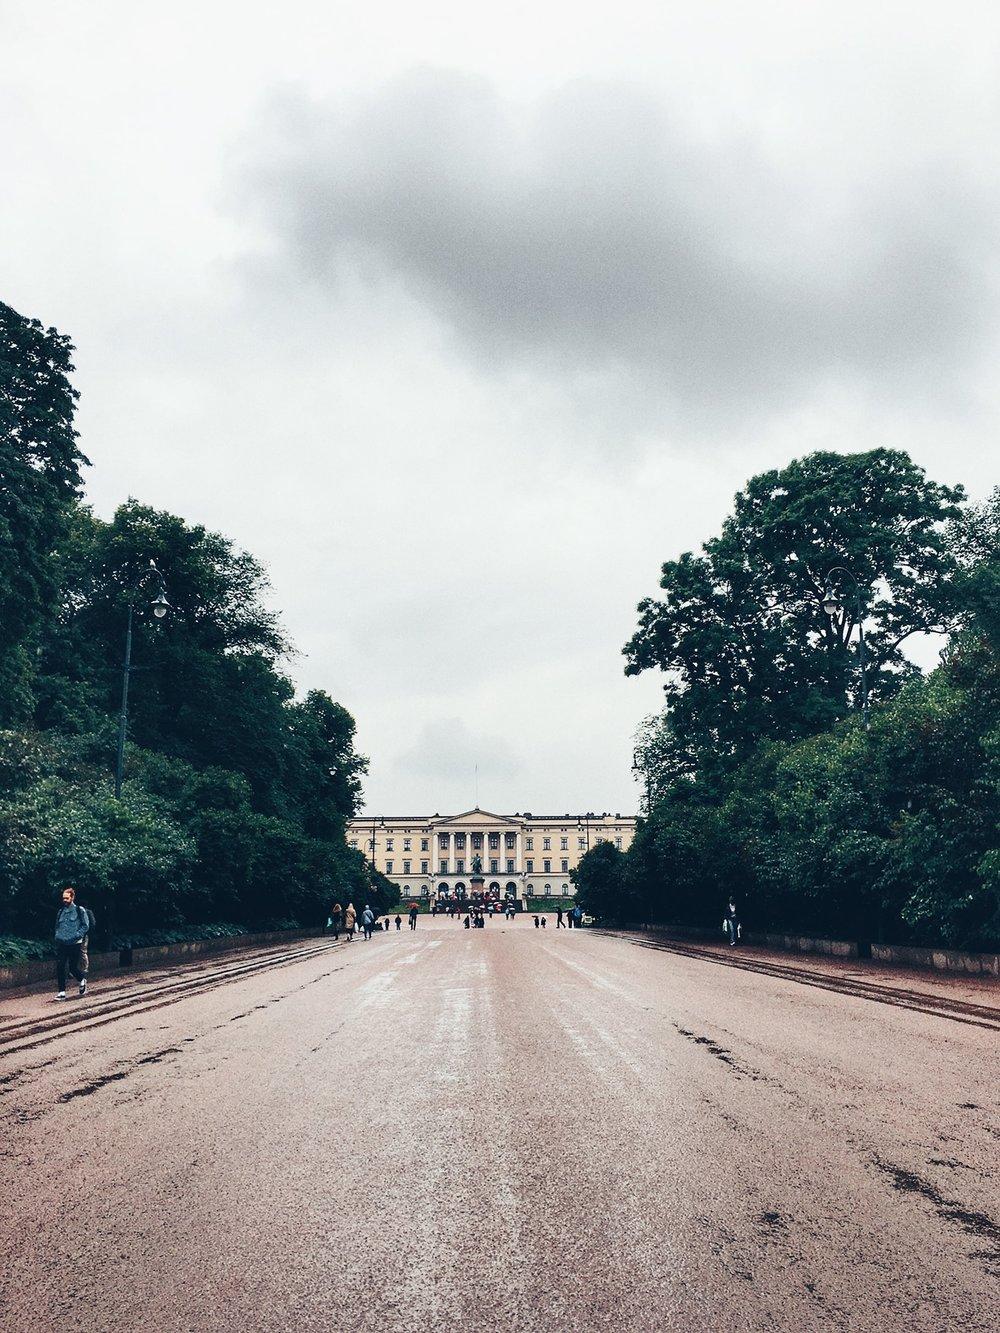 The Royal Palace (Oslo, Norway)